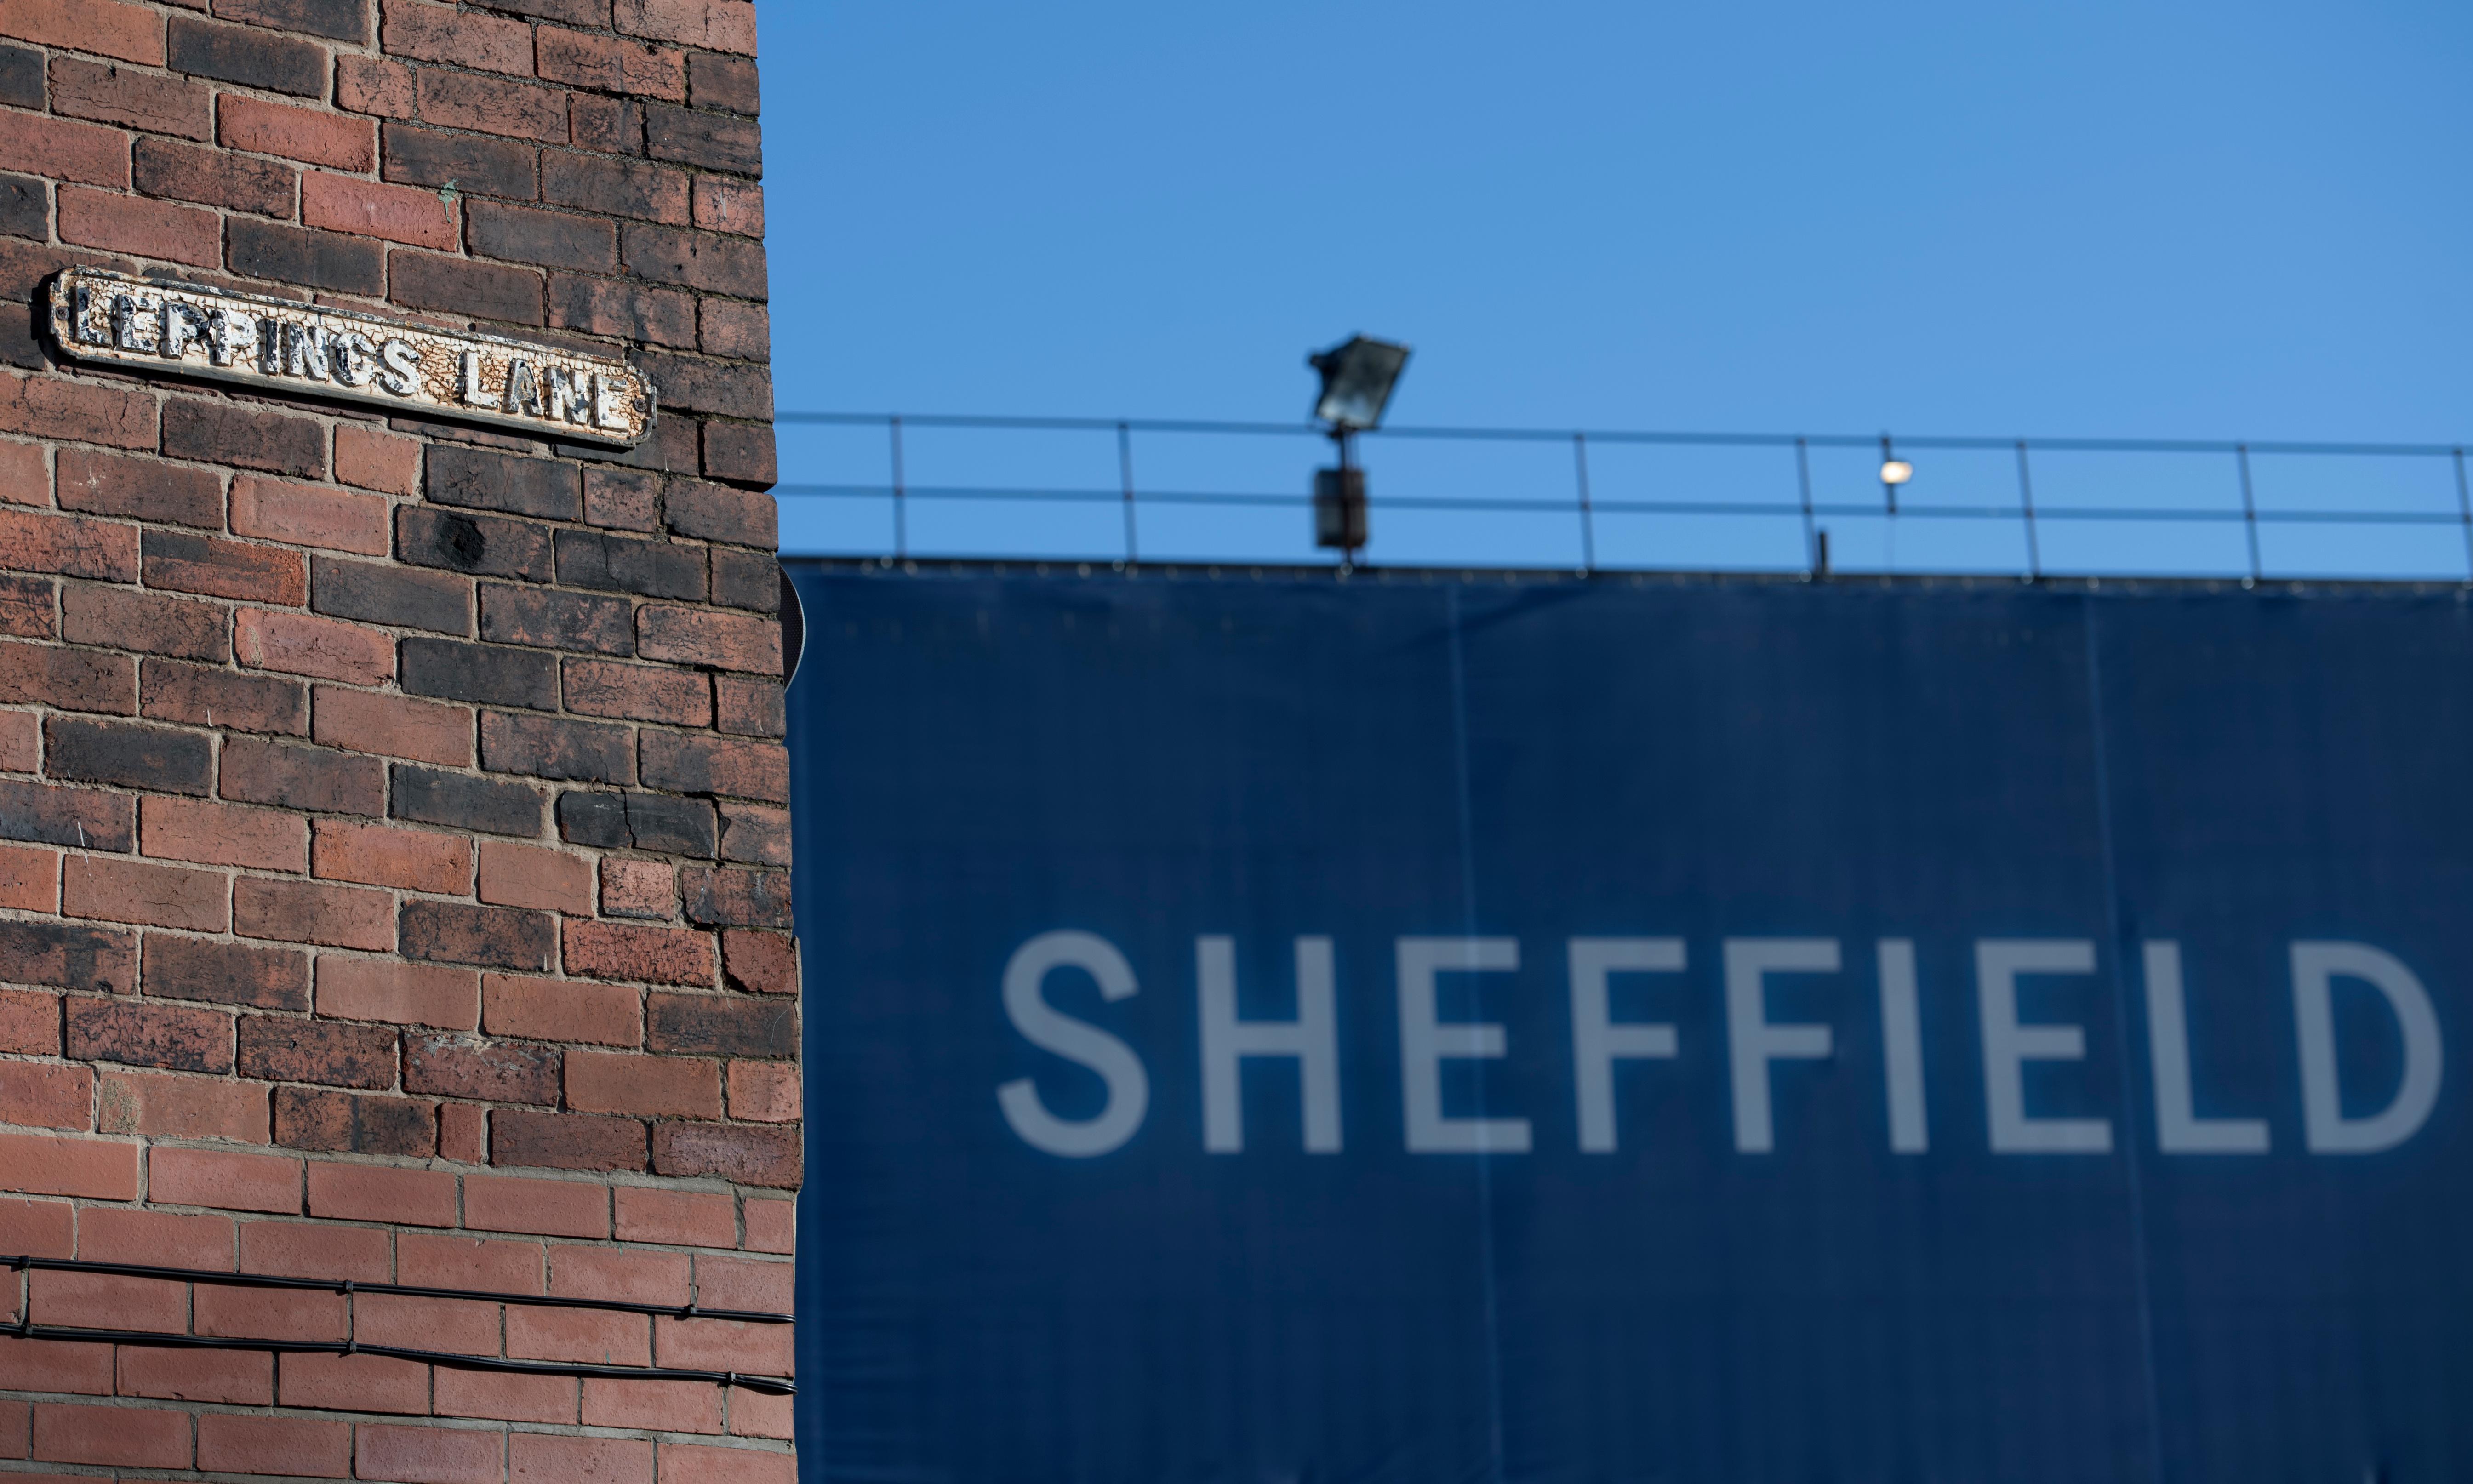 Hillsborough pitch 'like a battleground' after crush, court told